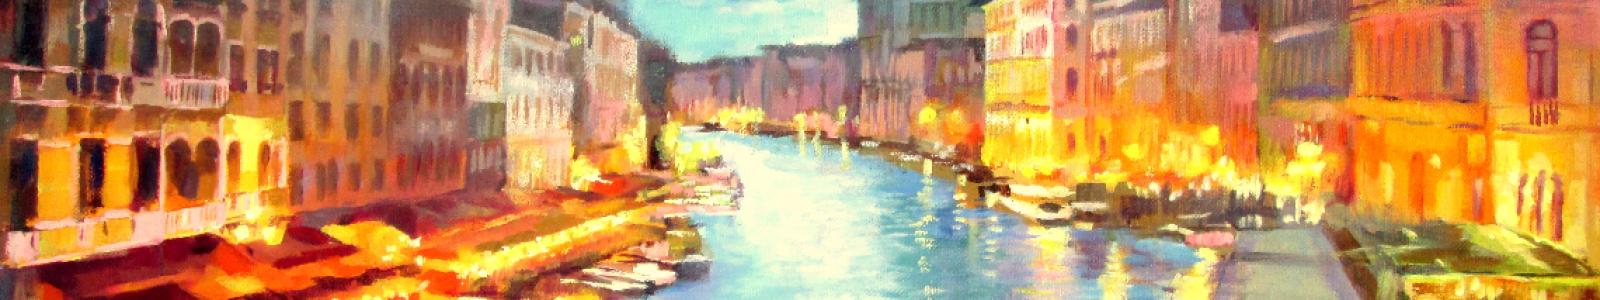 Gallery Painter Igor Pautov